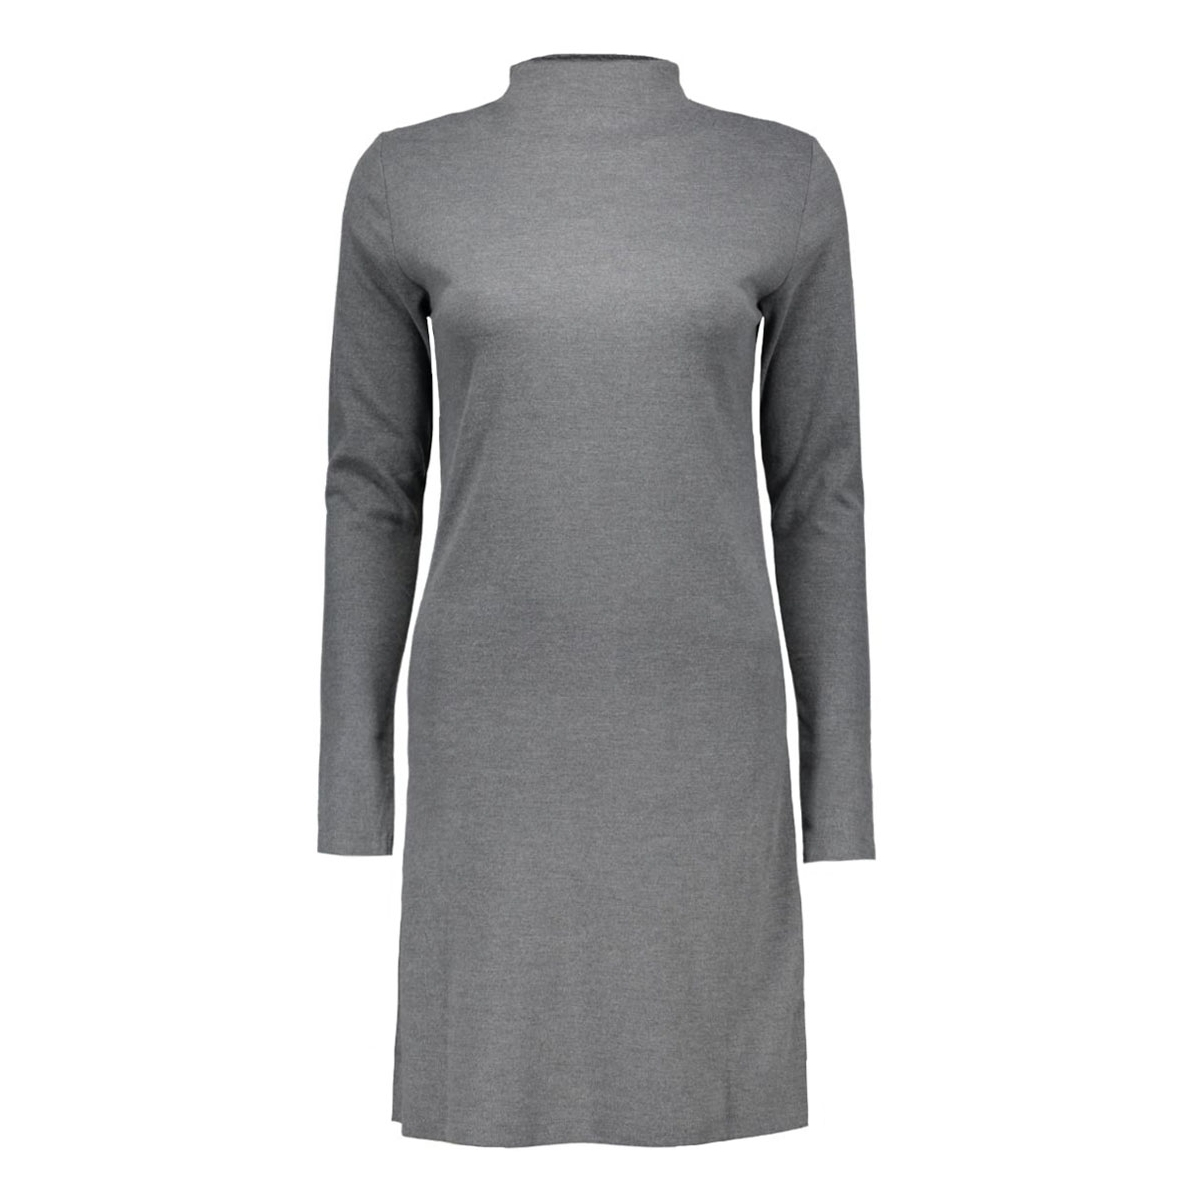 viklatra l/s dress 14037128 vila jurk medium grey melange